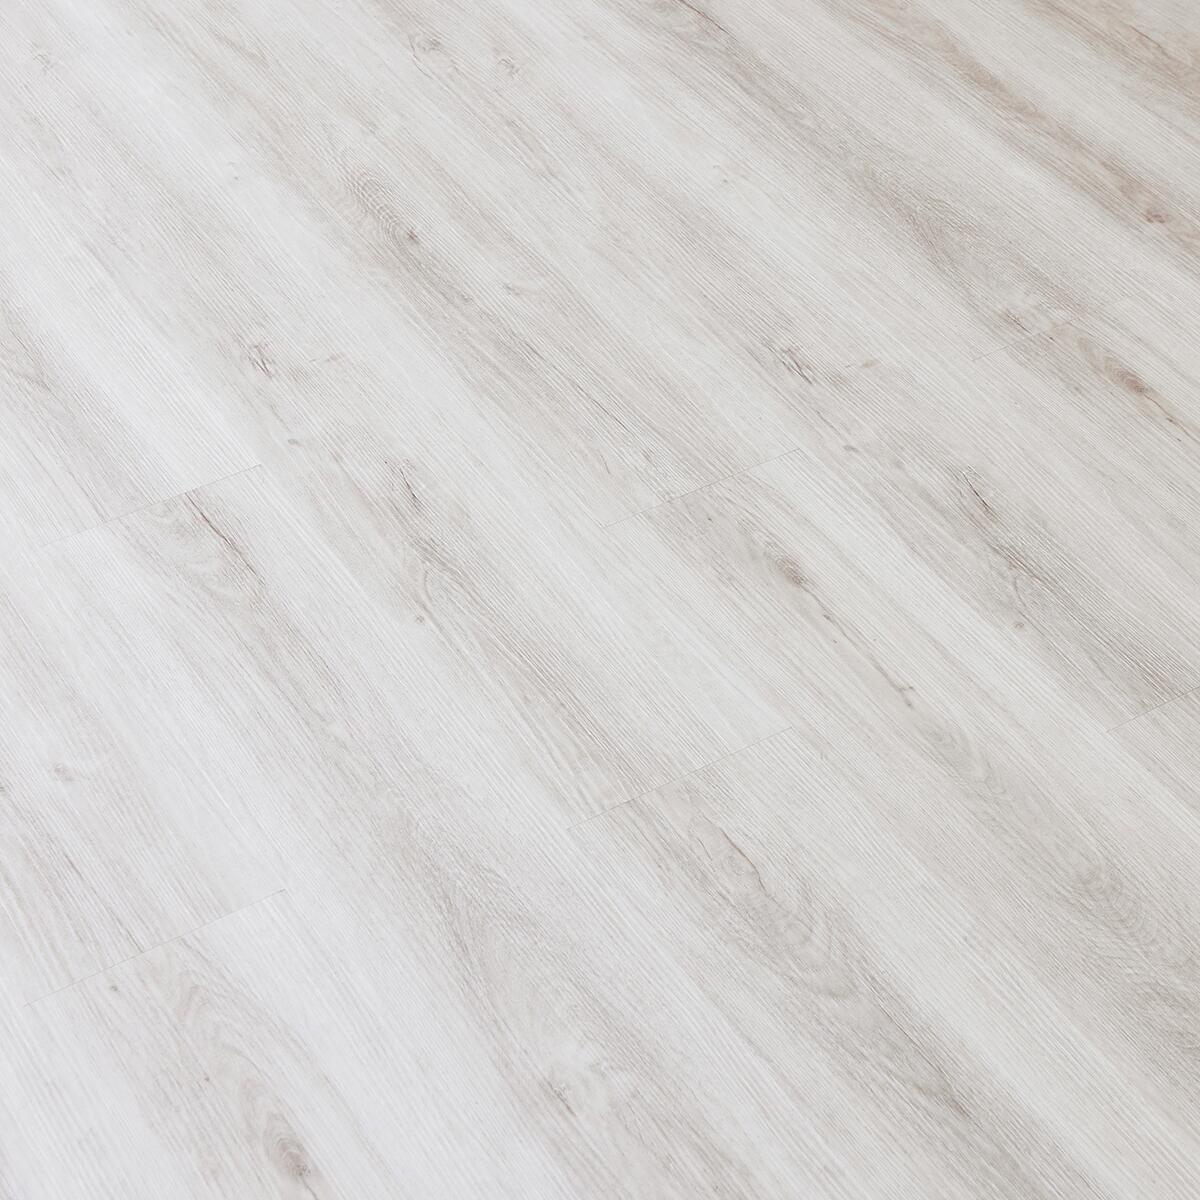 Pavimento SPC flottante clic+ Davos Sp 5 mm bianco - 3